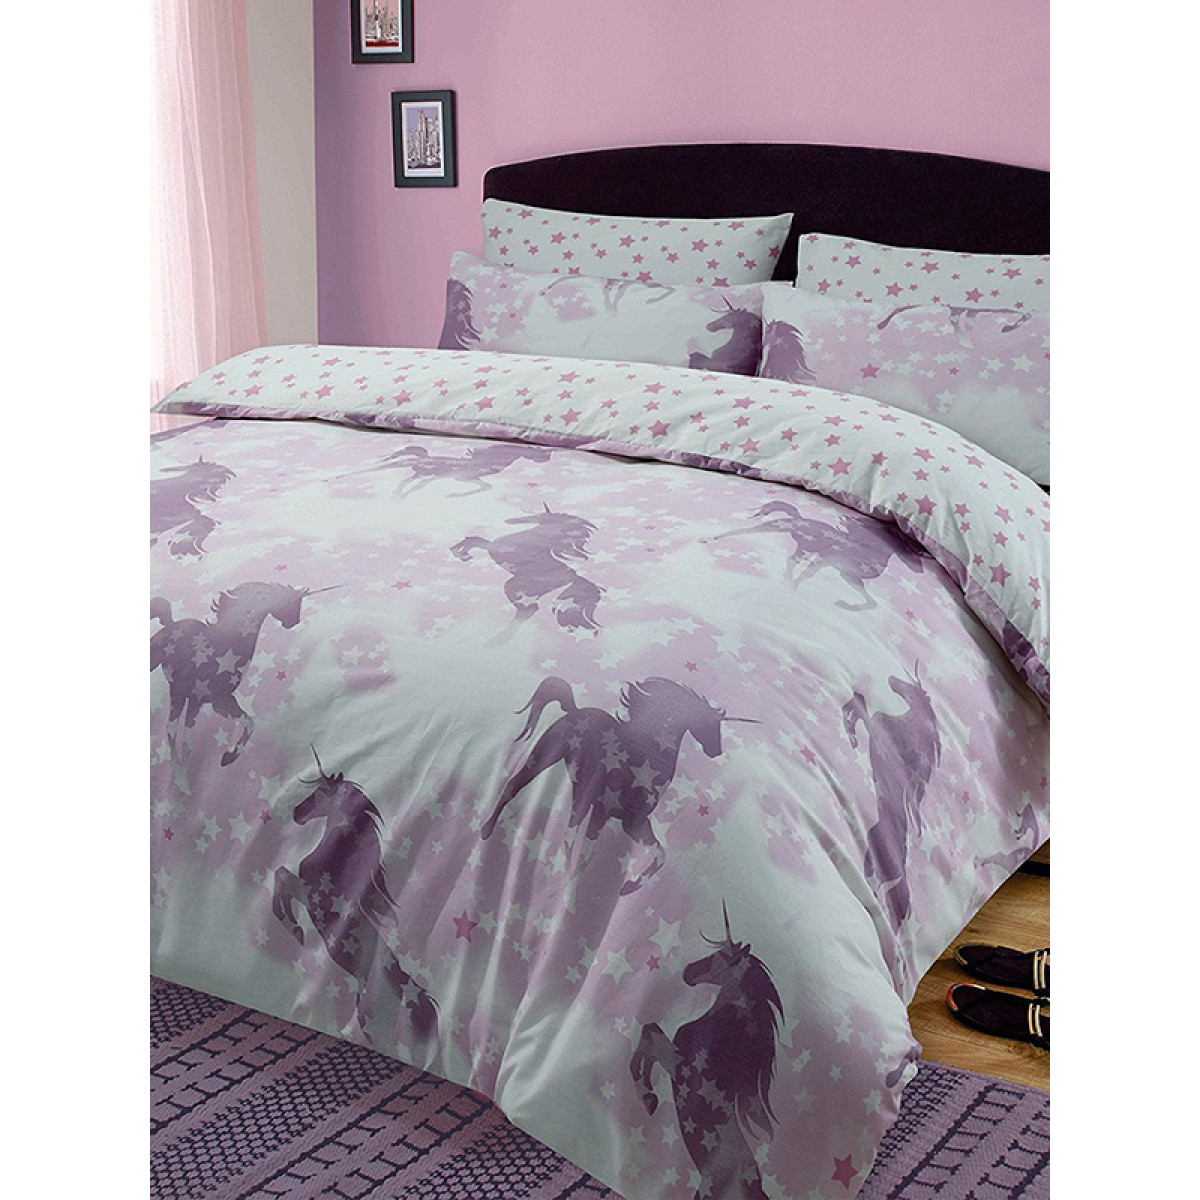 Unicorn Dreams Double Duvet Cover And Pillowcase Set